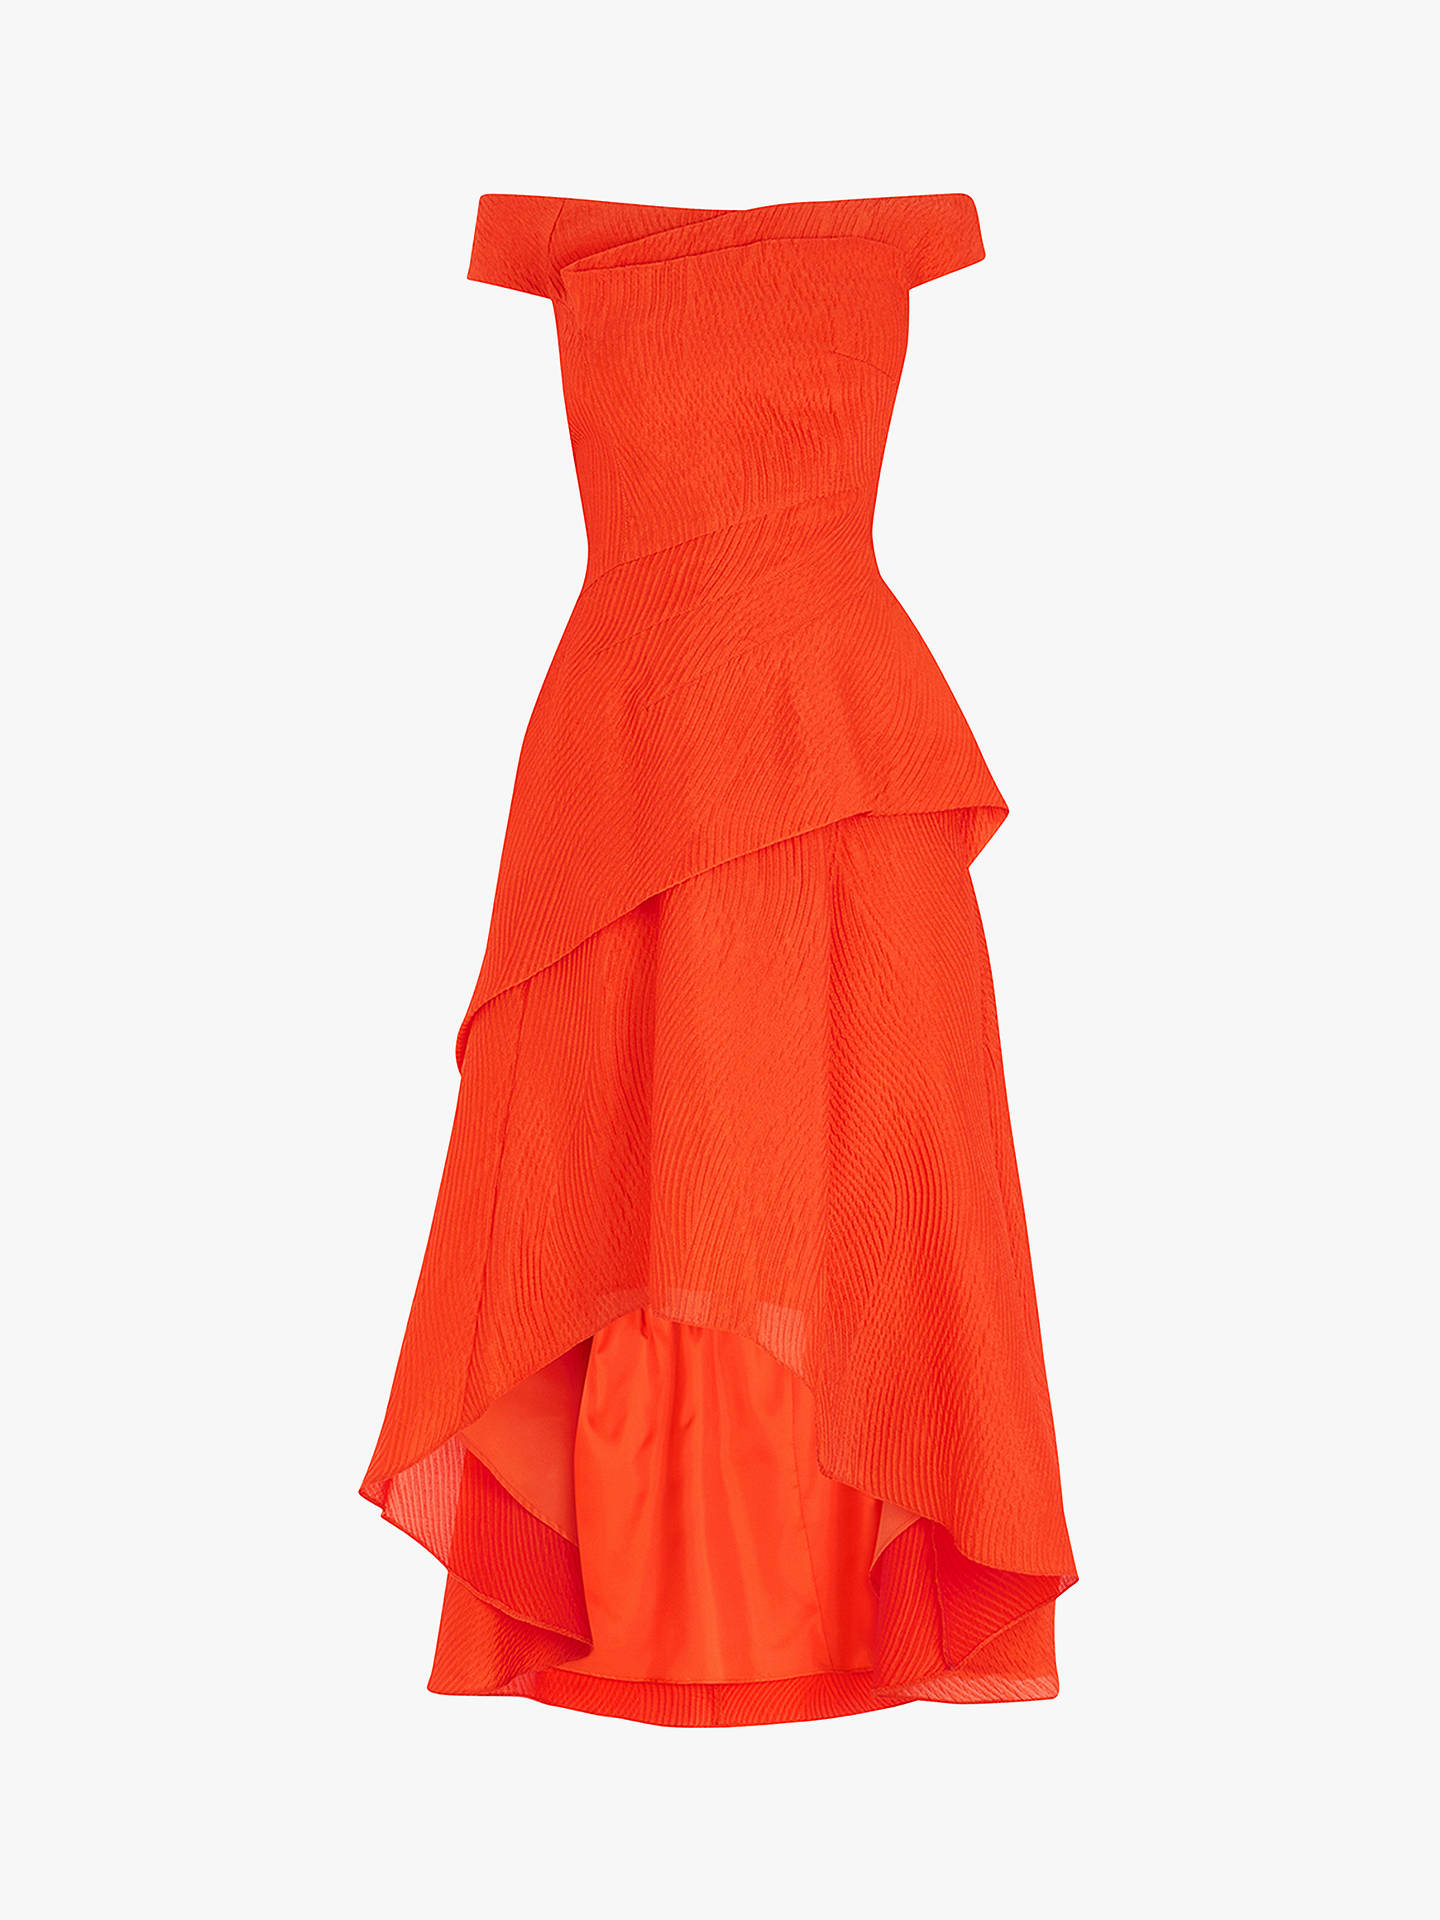 d6eb2ad2e2d982 ... Buy Coast Textured Hi Low Dress, Orange, 6 Online at johnlewis.com ...